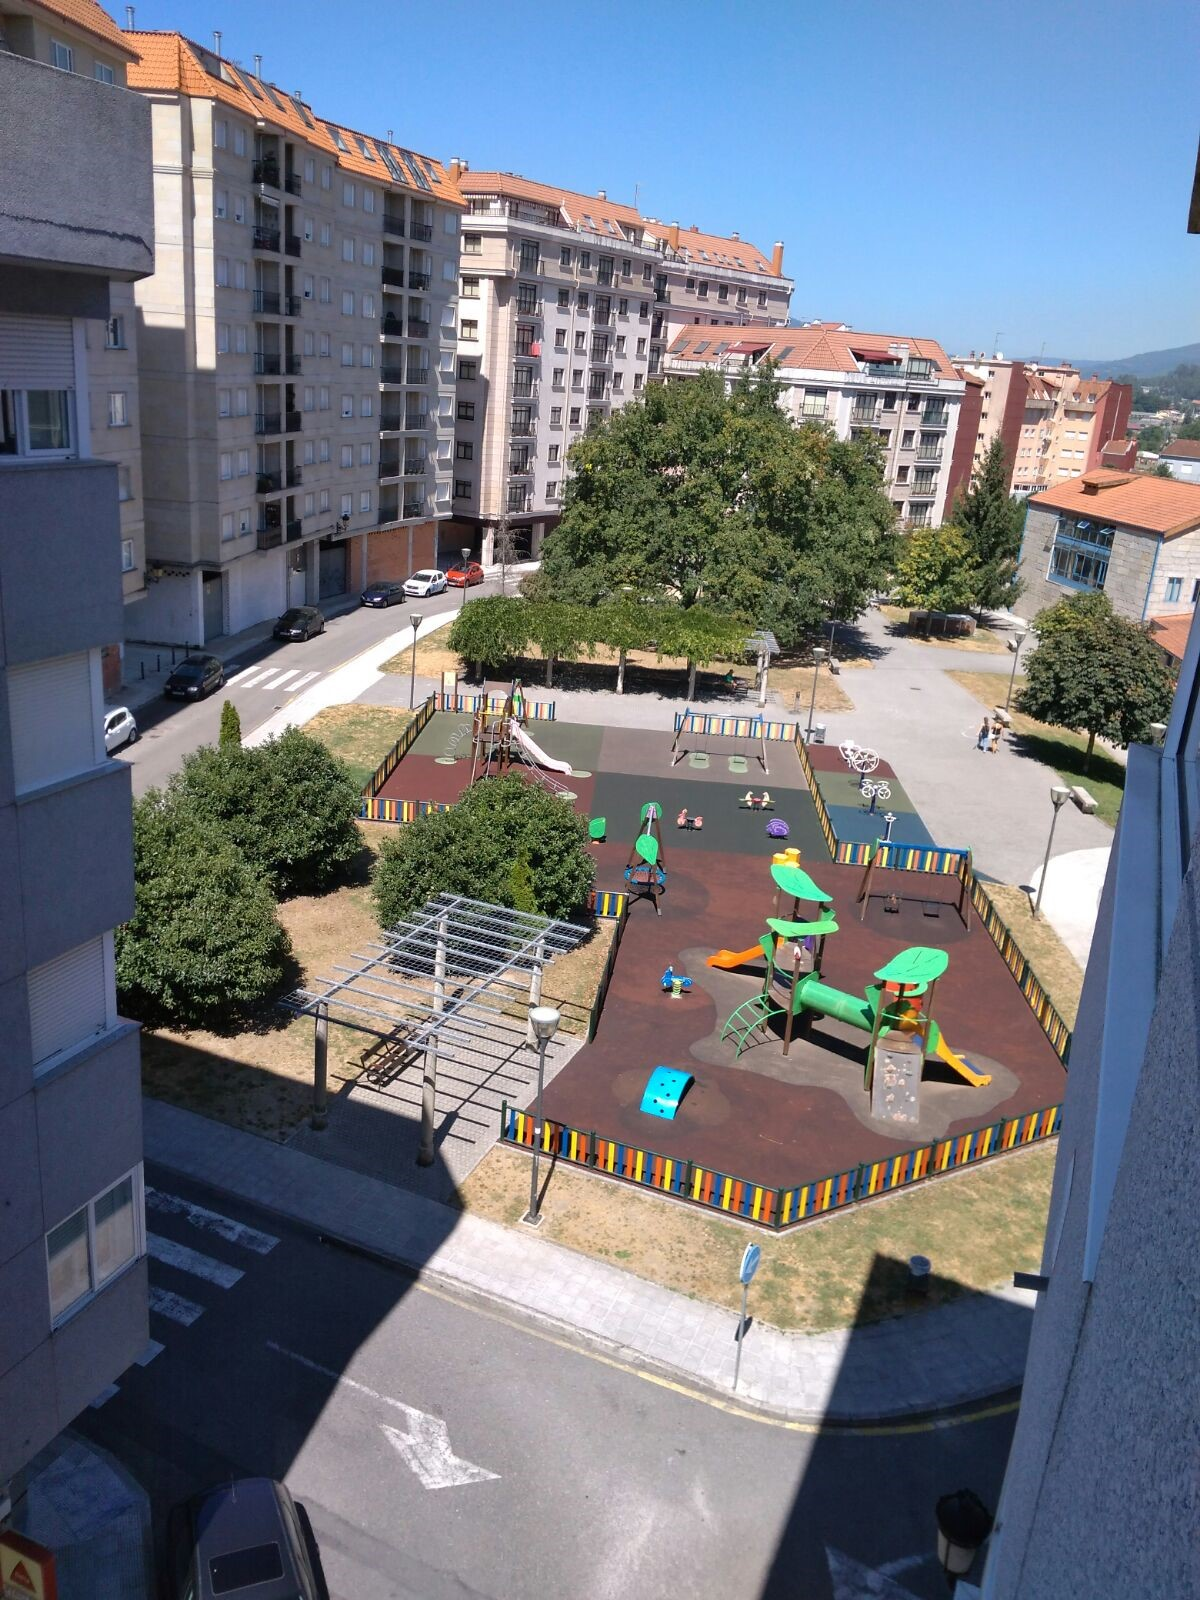 Parque Infantil A Perillana – Estado Actual2